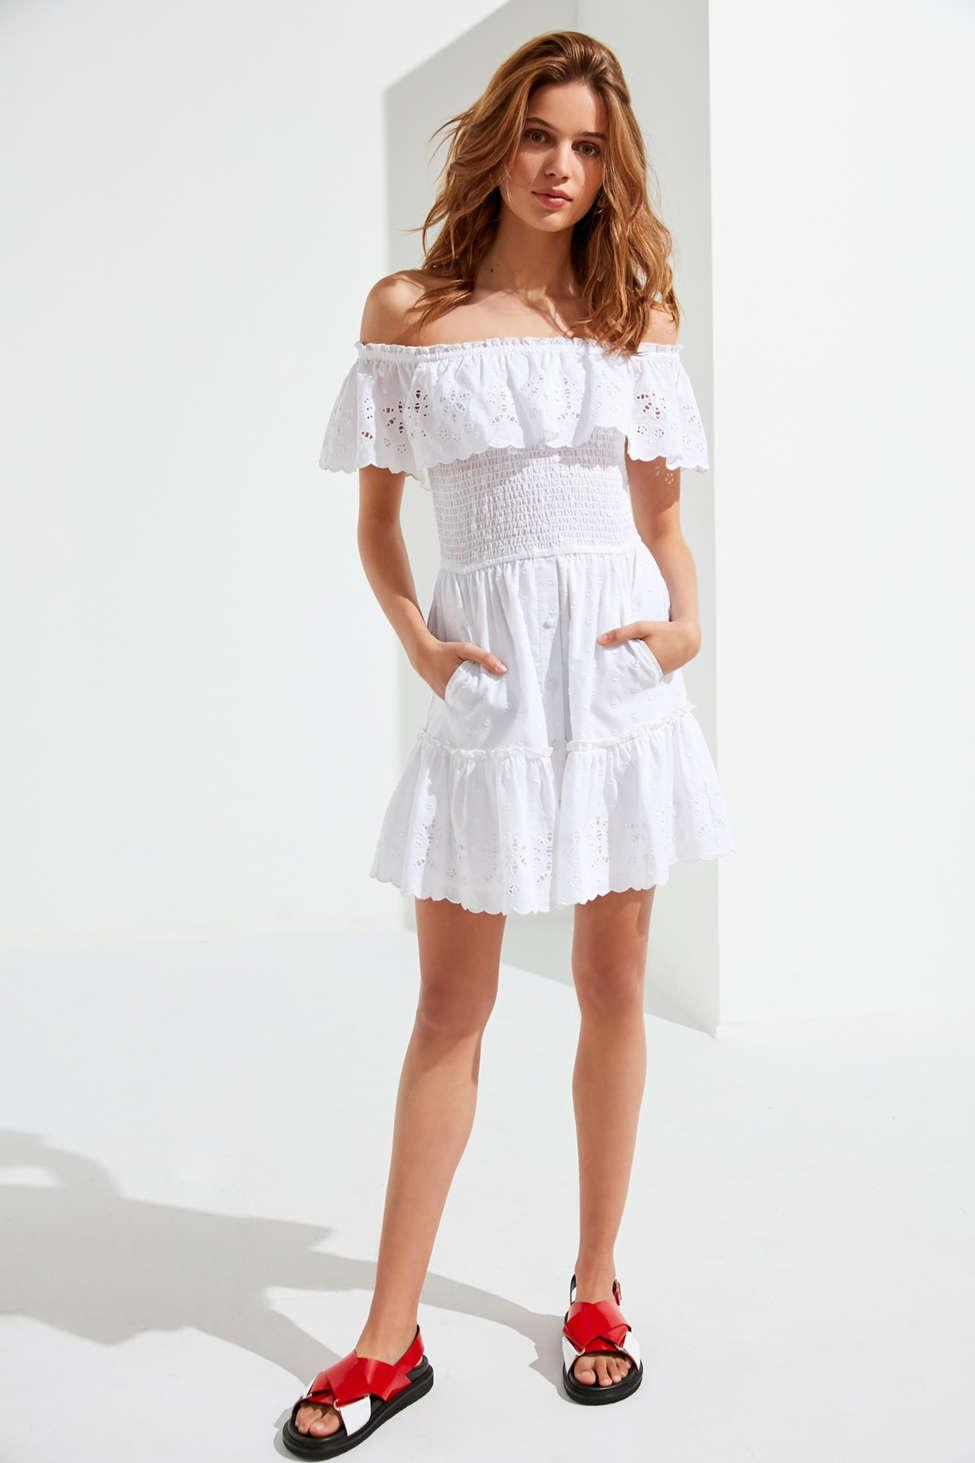 f6e4e1f1e7 Lyst - RahiCali Off-the-shoulder Eyelet Mini Dress in White